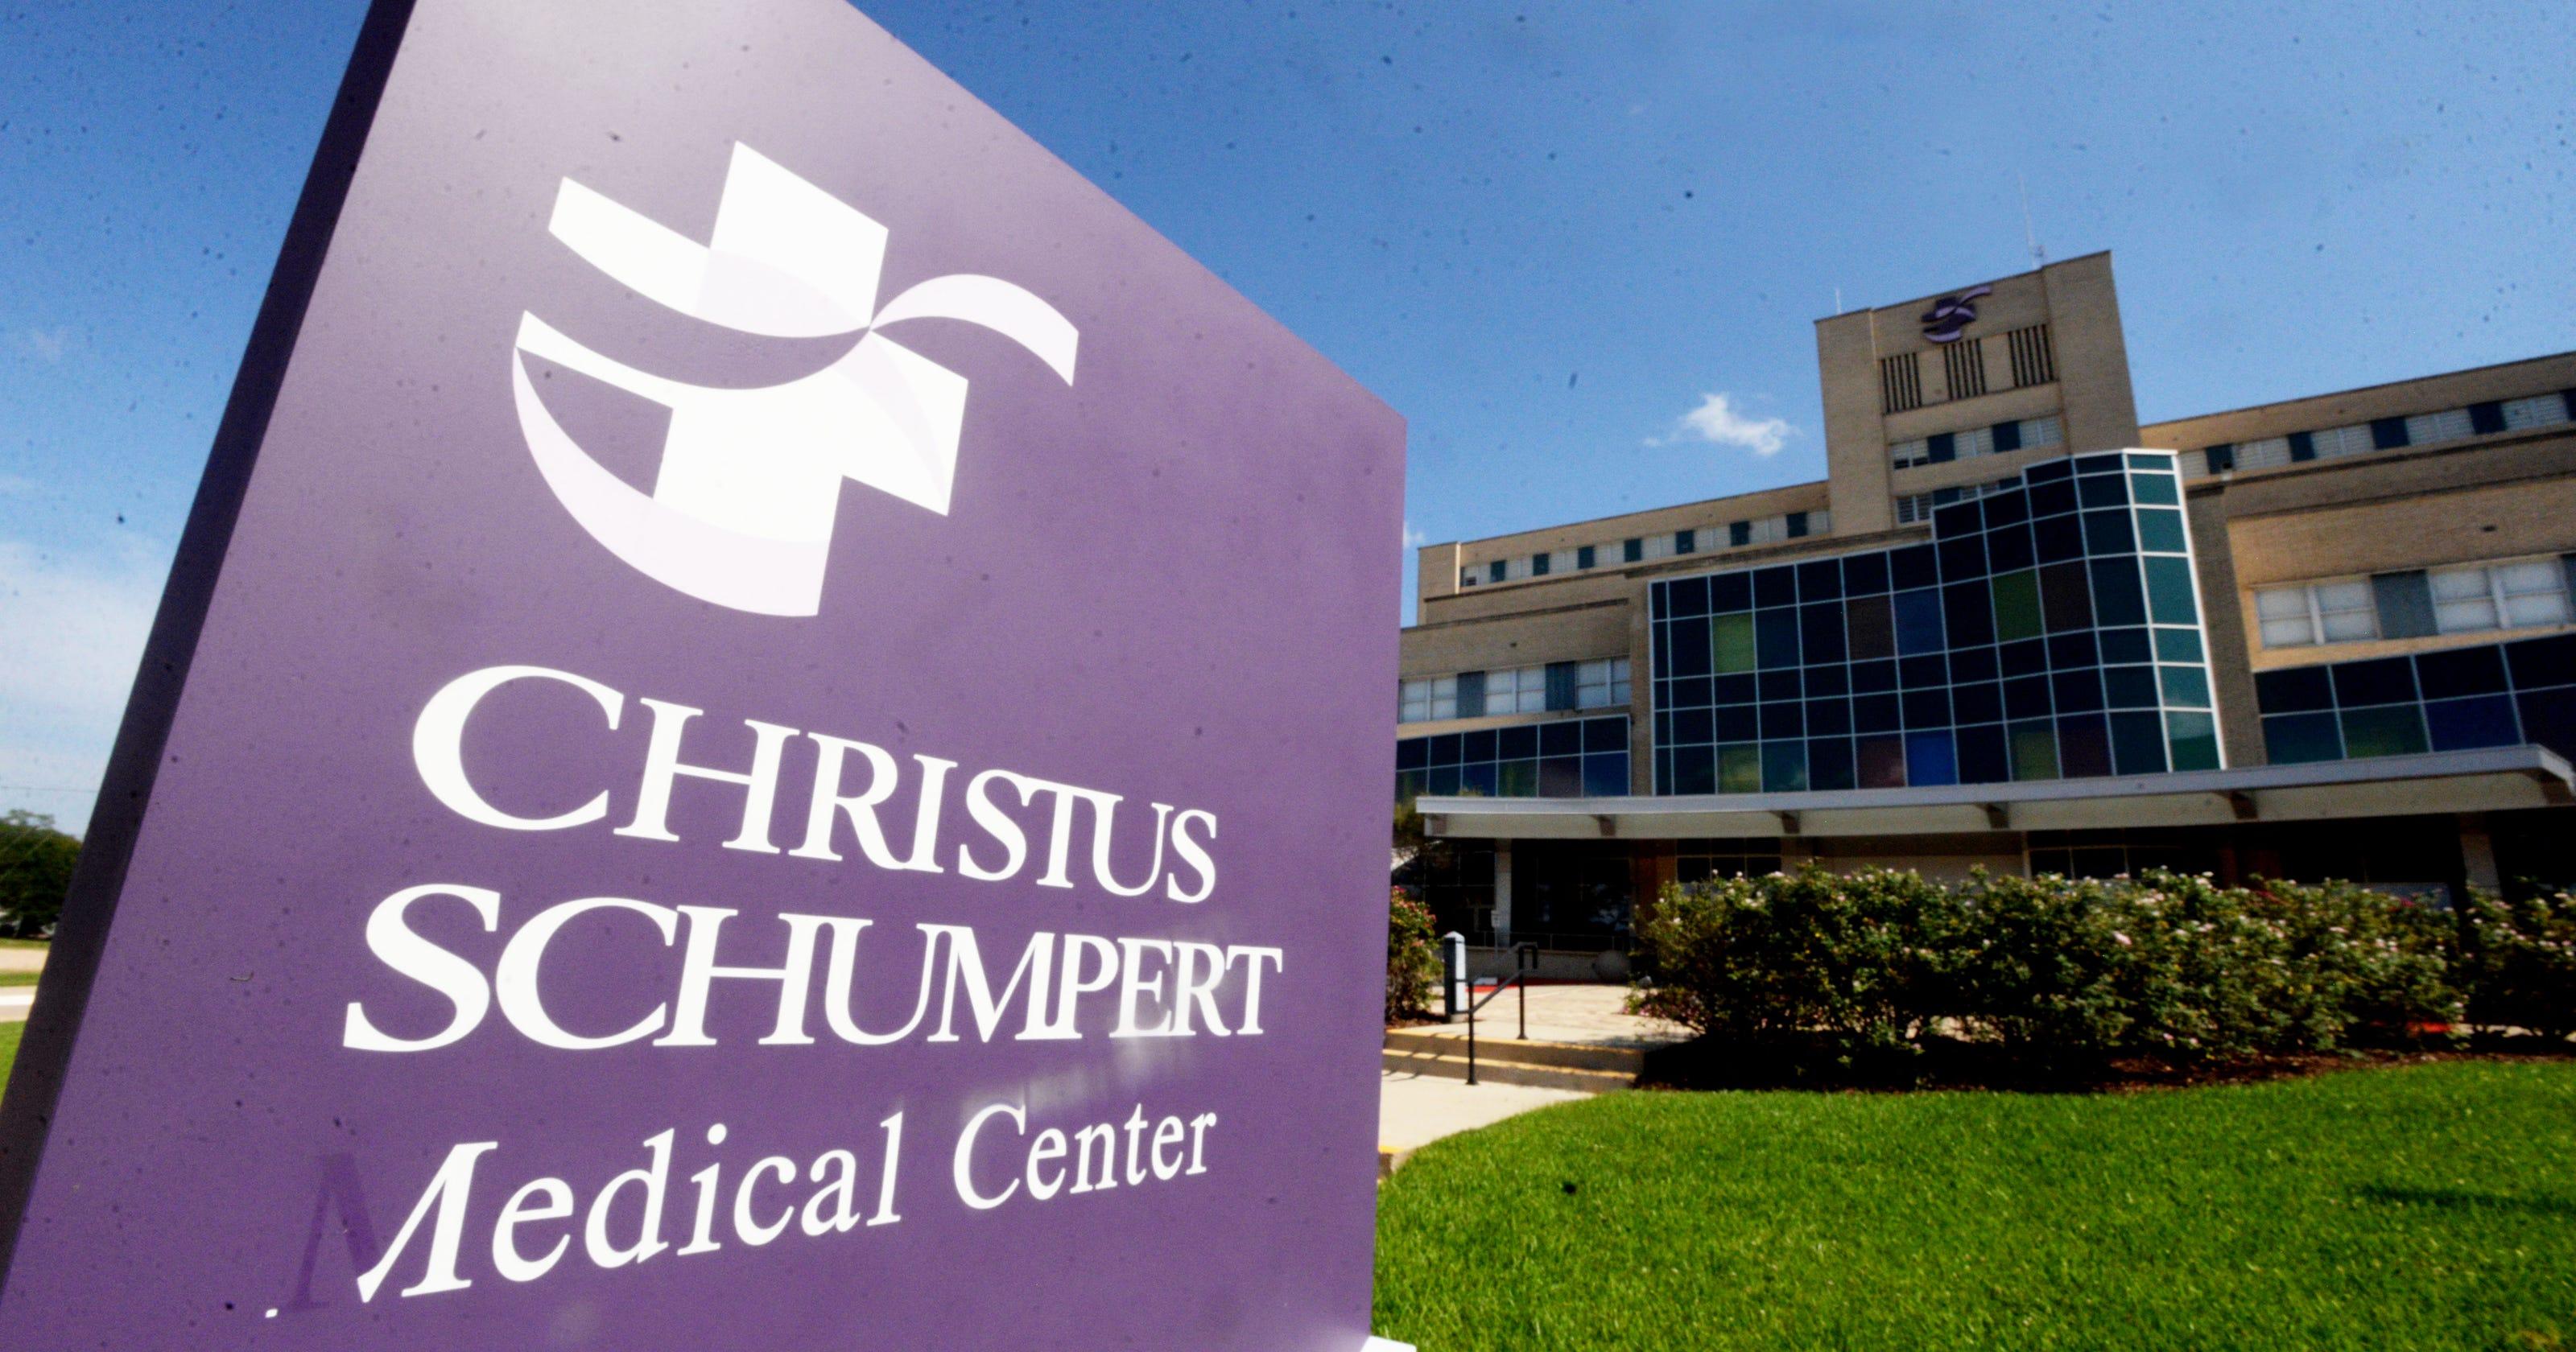 Working at Christus Schumpert Medical Center | kununu